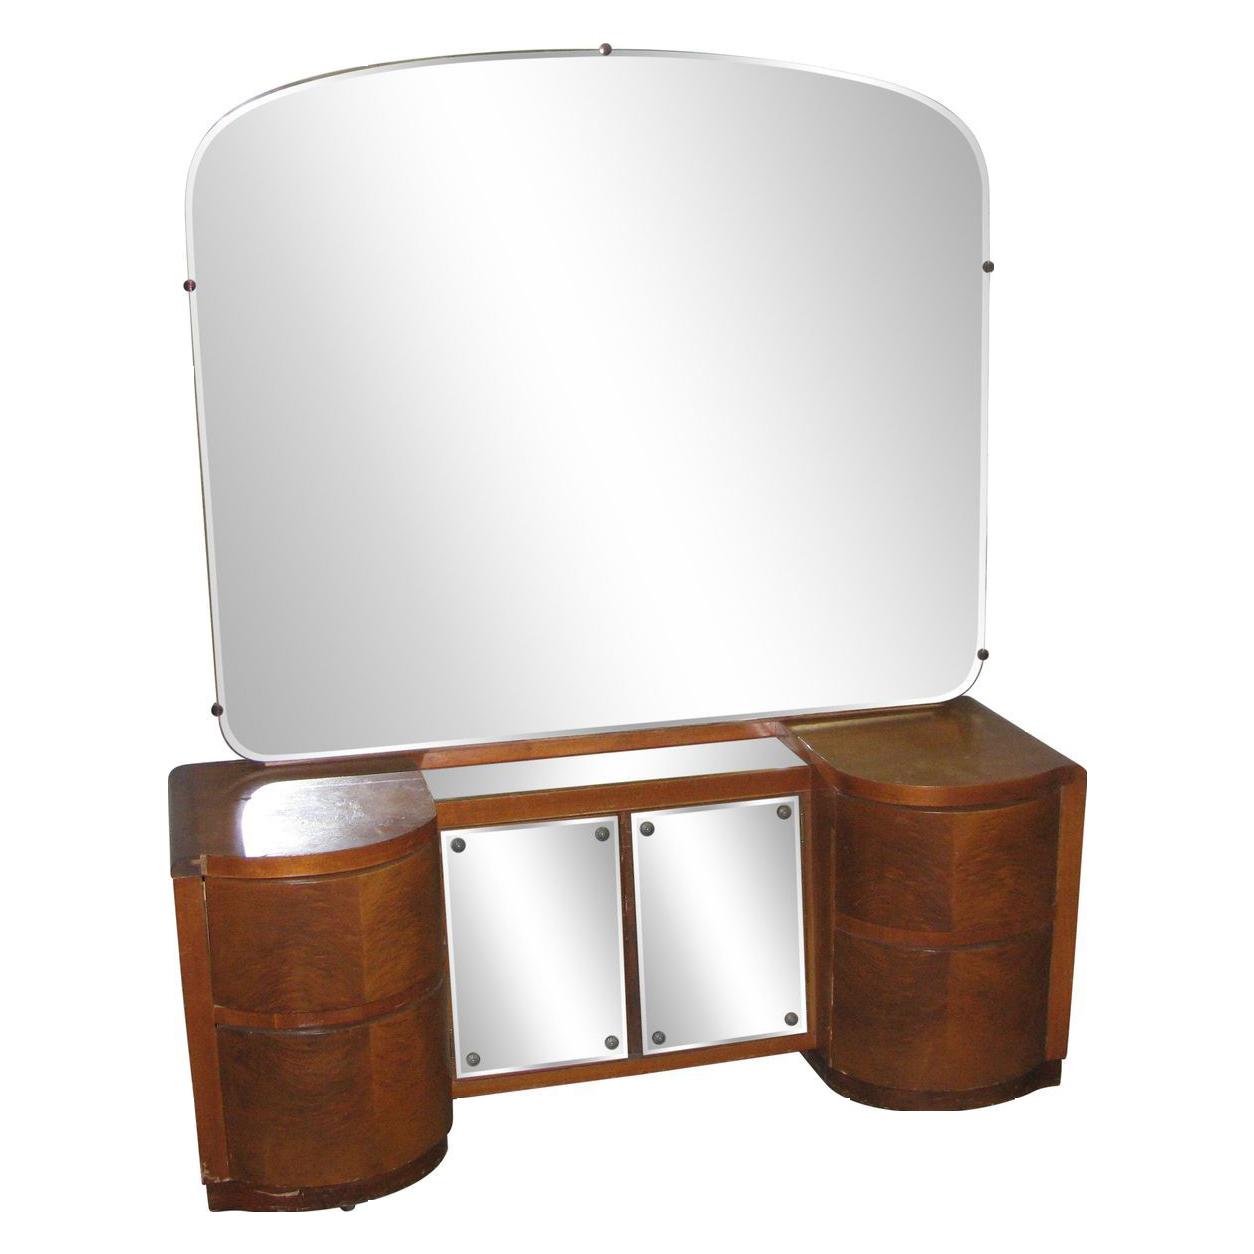 Vintage Deco vanity with mirror